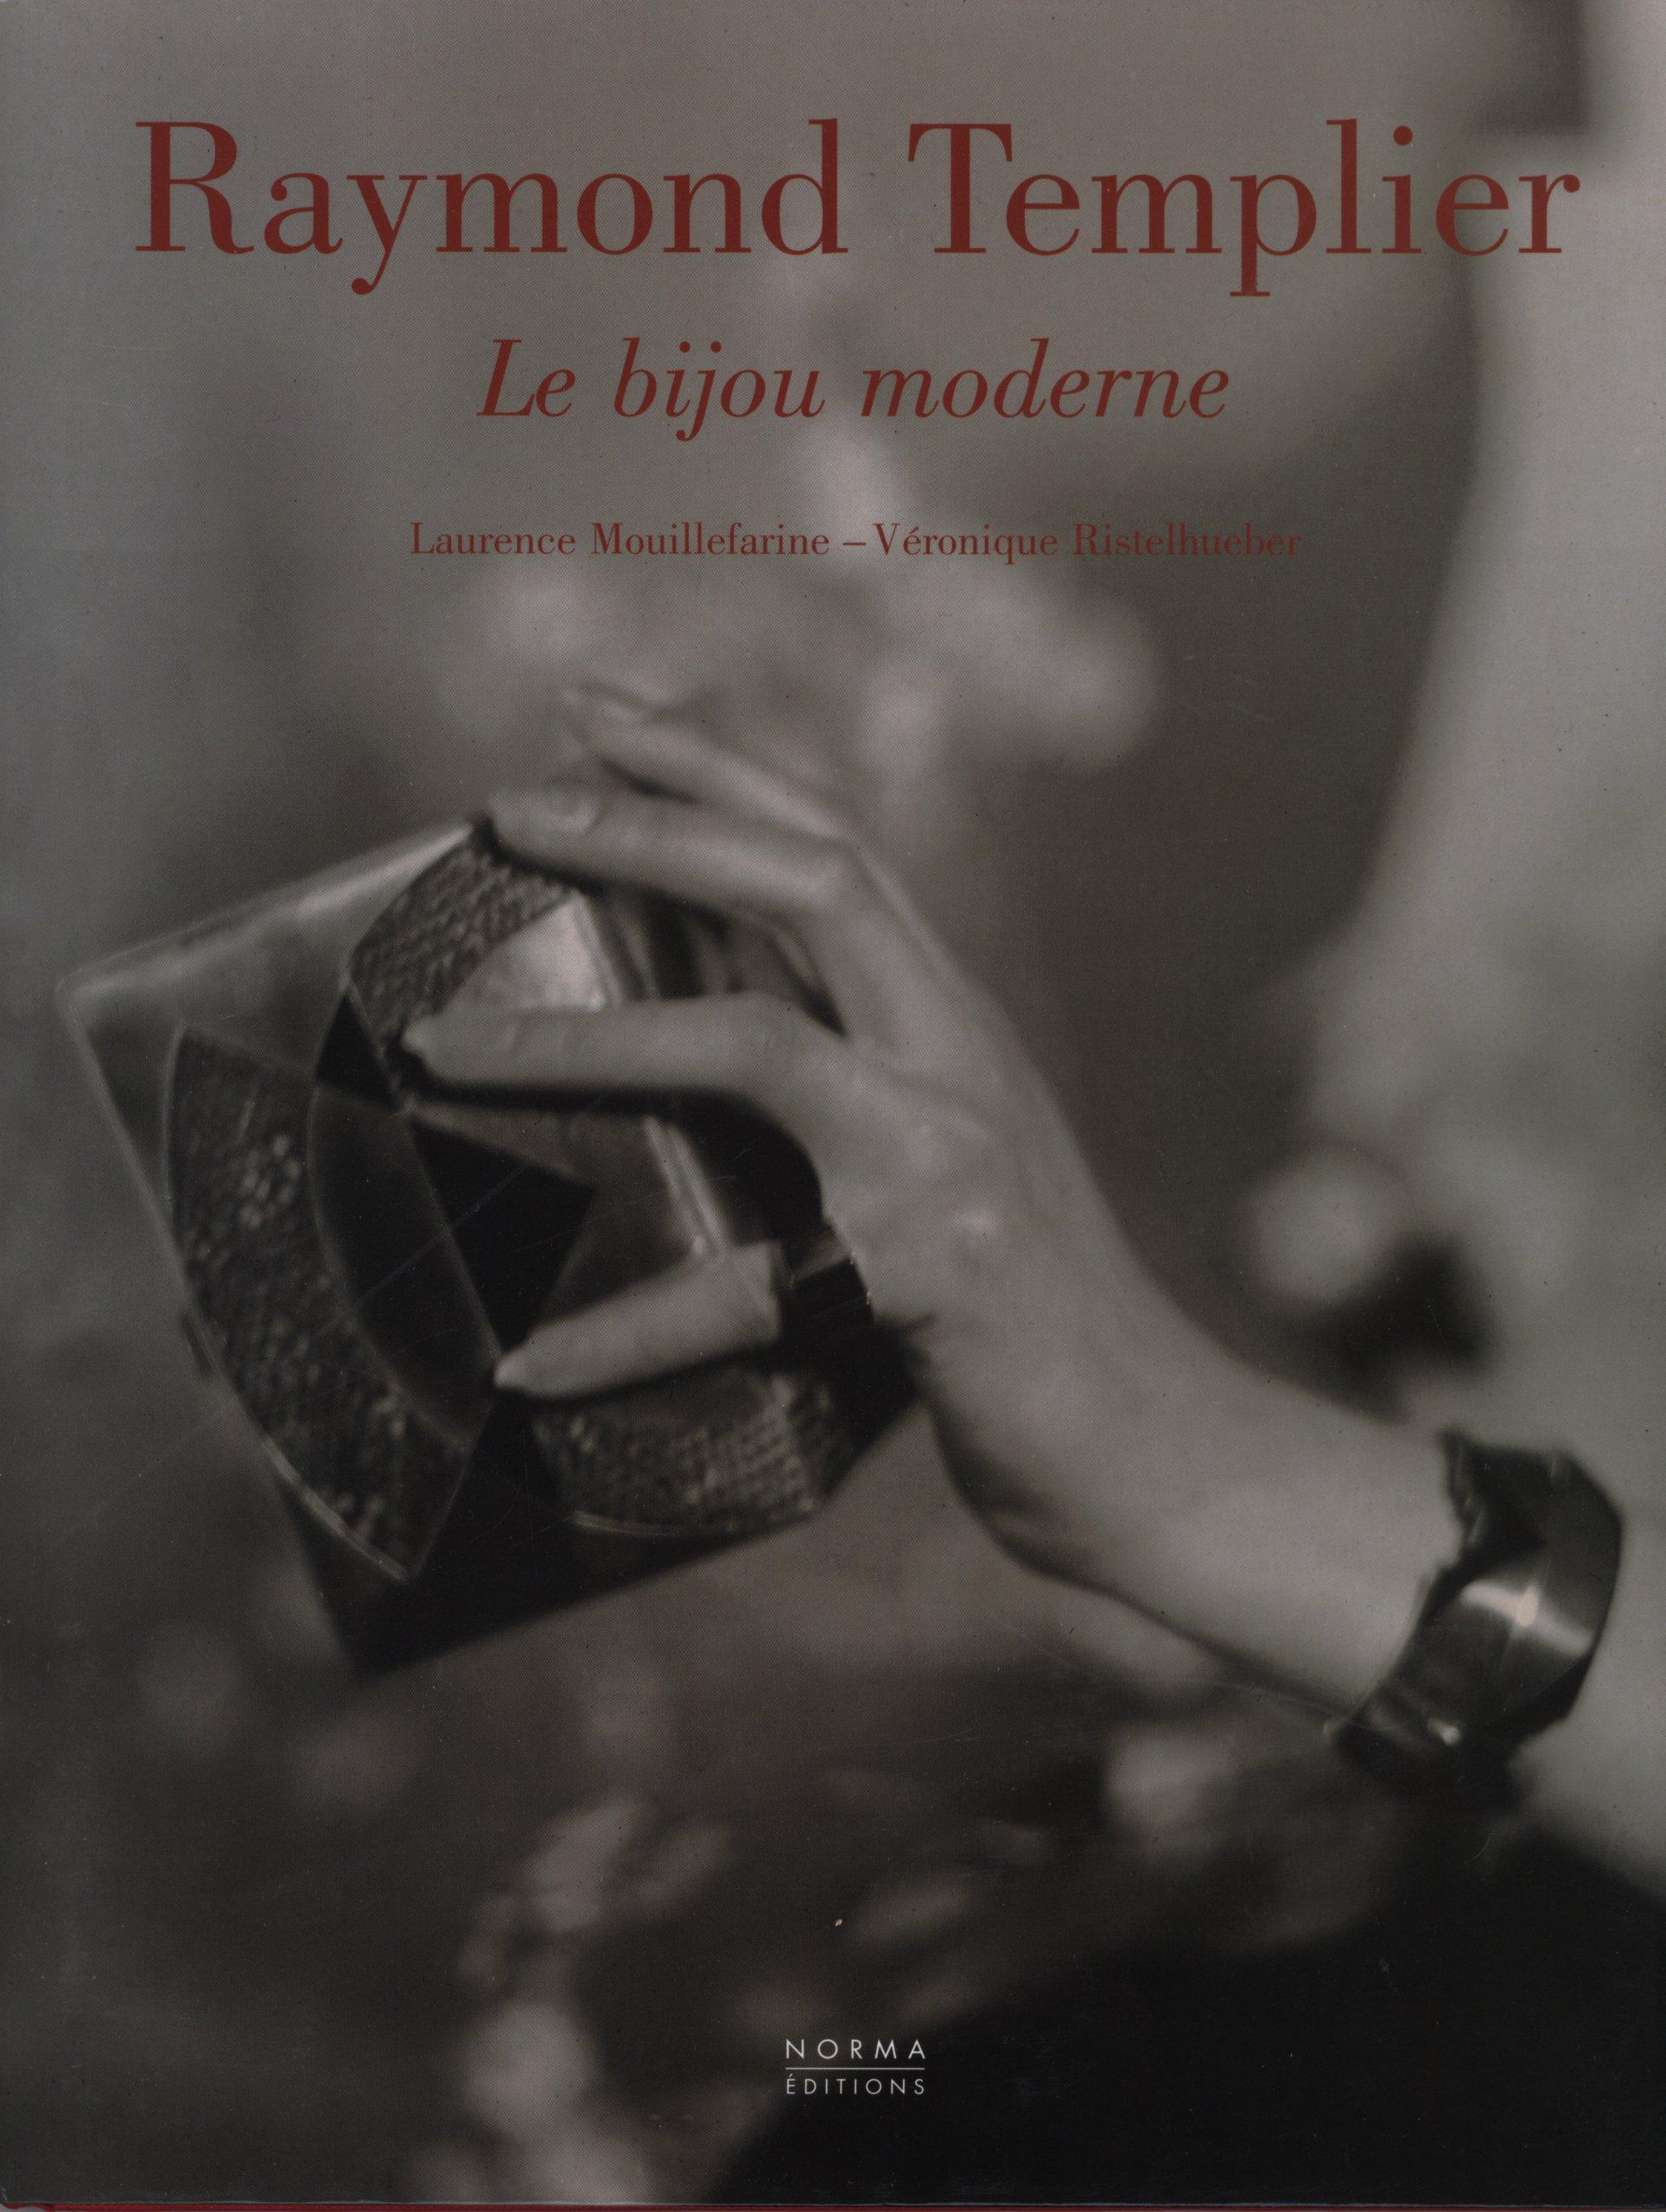 Download Raymond Templier ; le bijou moderne ebook